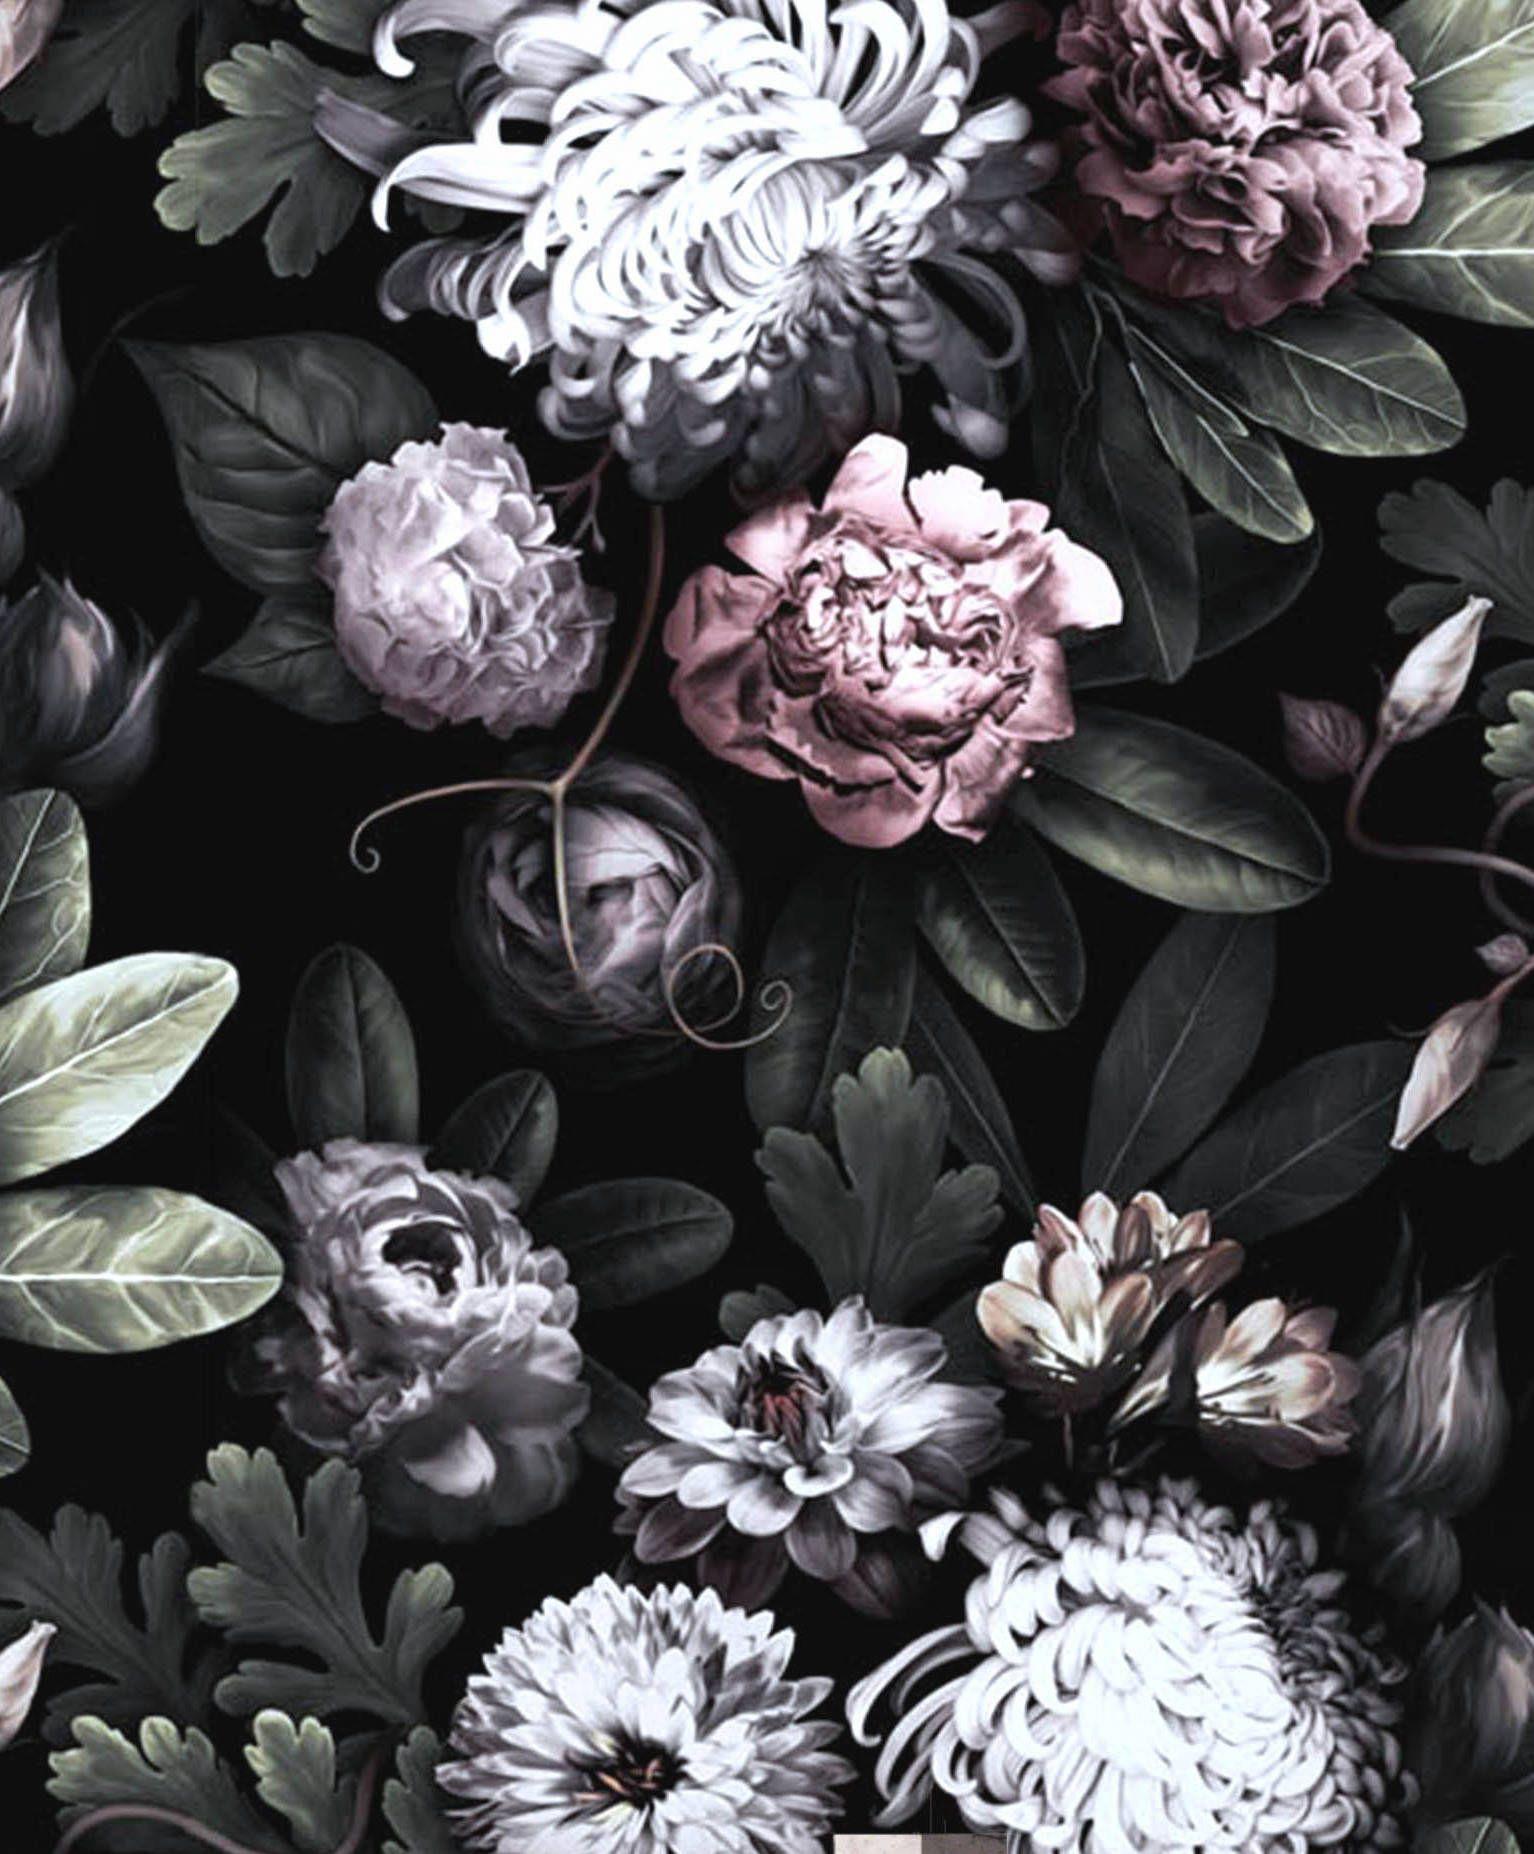 Dark Floral Wallpaper, floral wallpaper, dark flowers